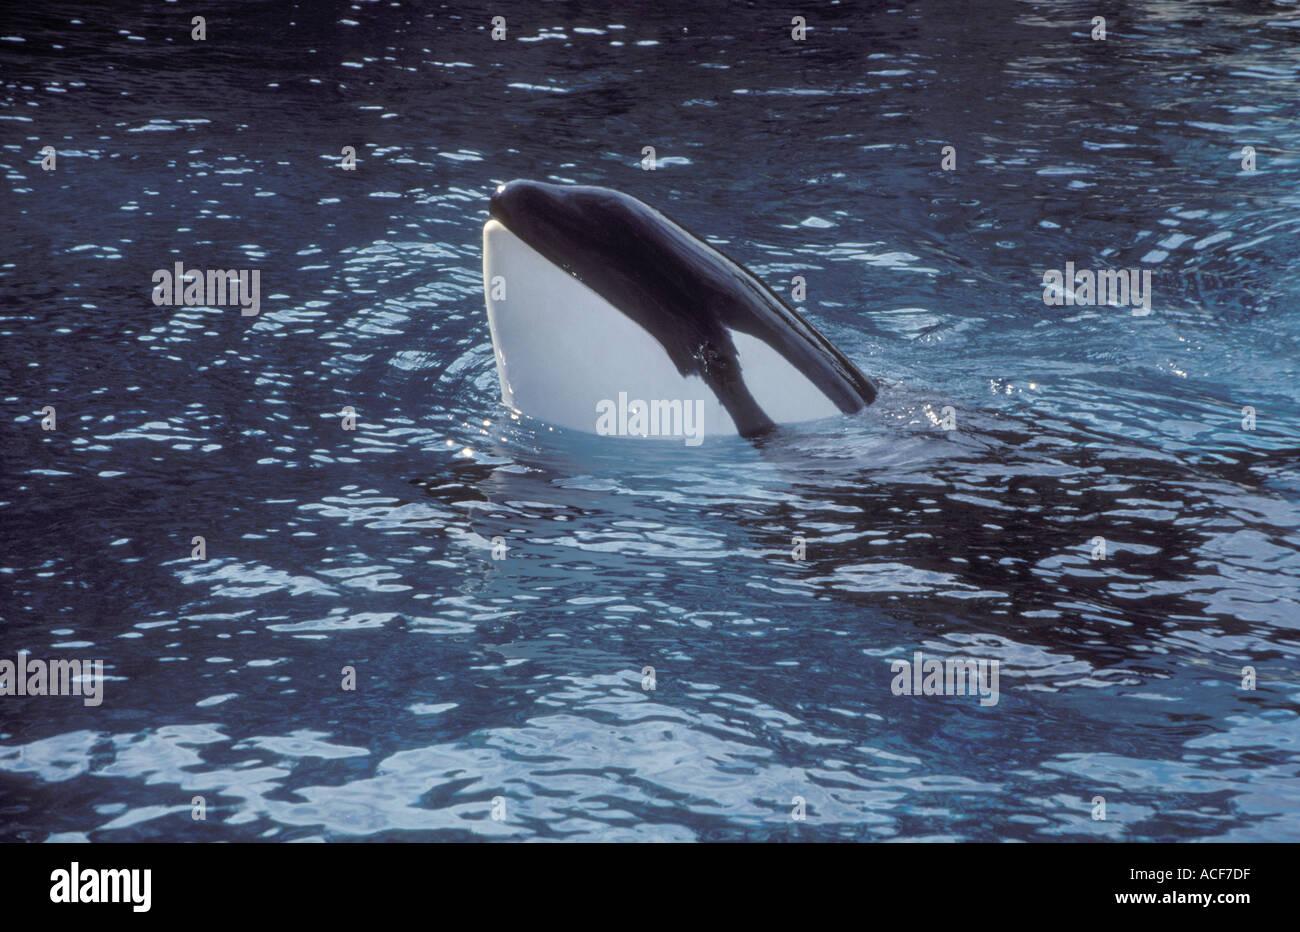 Orca whale spy hop Stock Photo